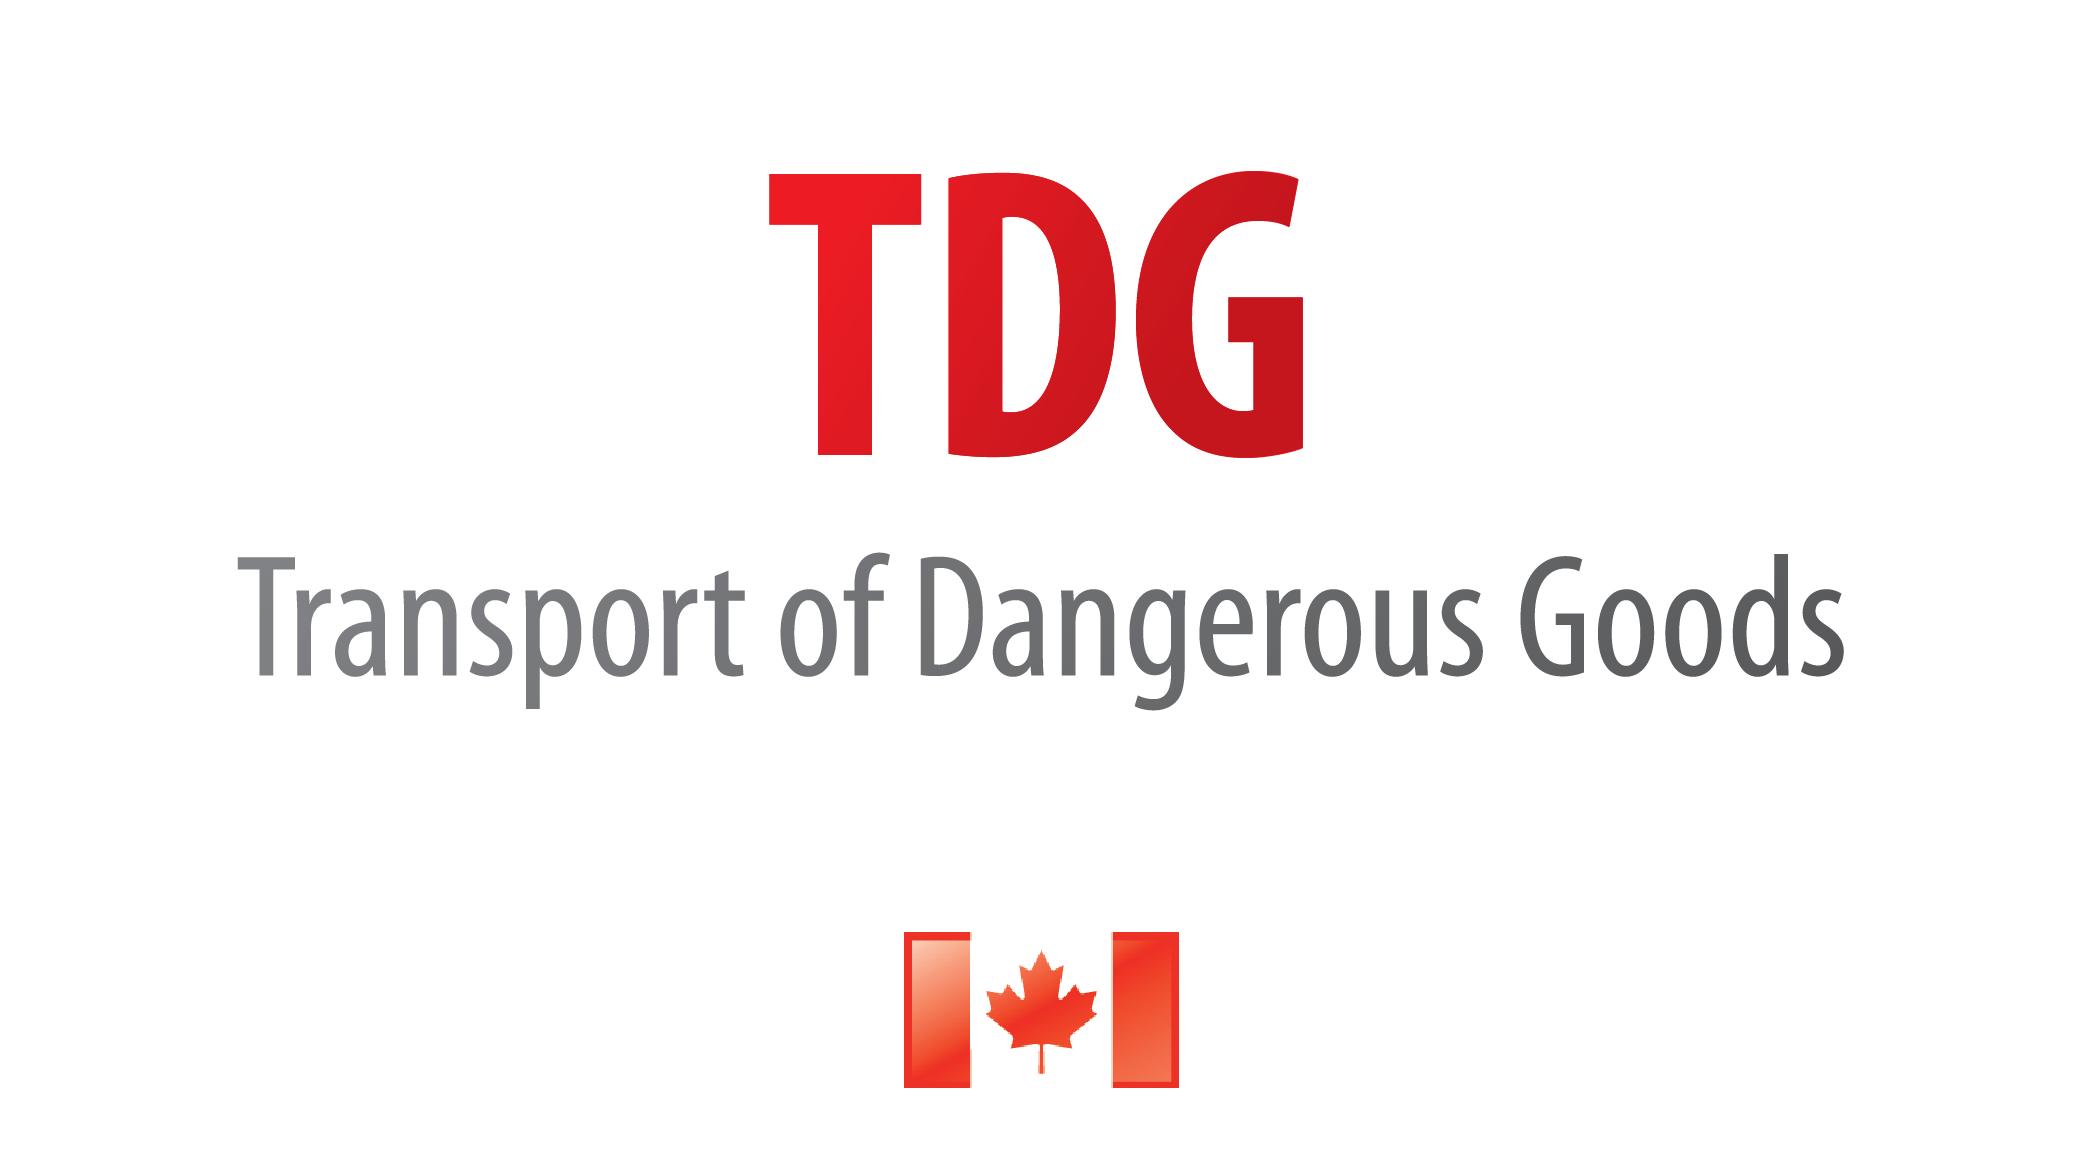 Clear Language Transportation of Dangerous Goods